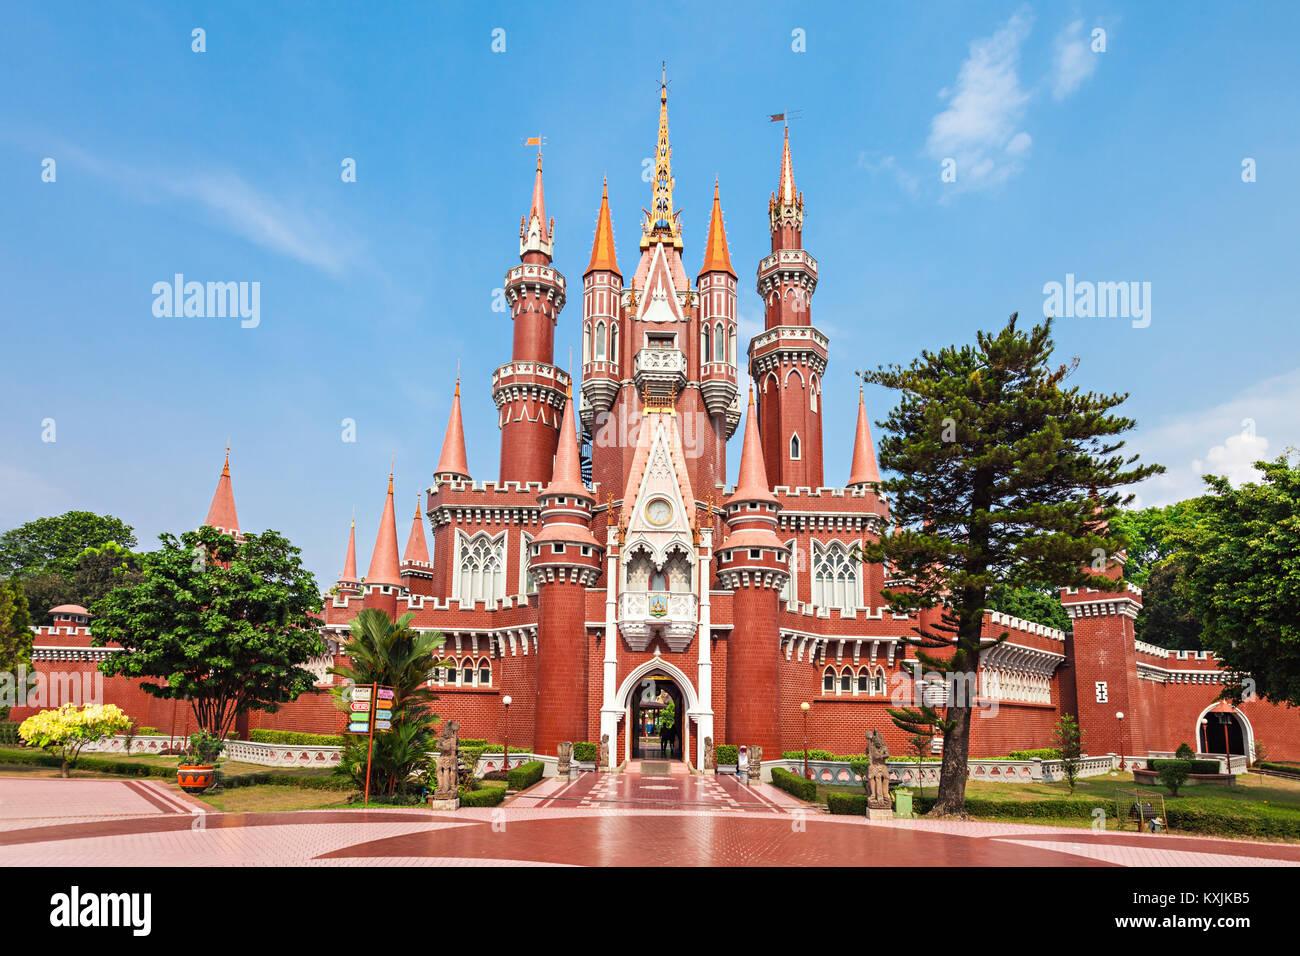 JAKARTA, INDONESIA - OCTOBER 20, 2014: Istana Anak Anak Playcentre in Taman Mini Indonesia Park. - Stock Image